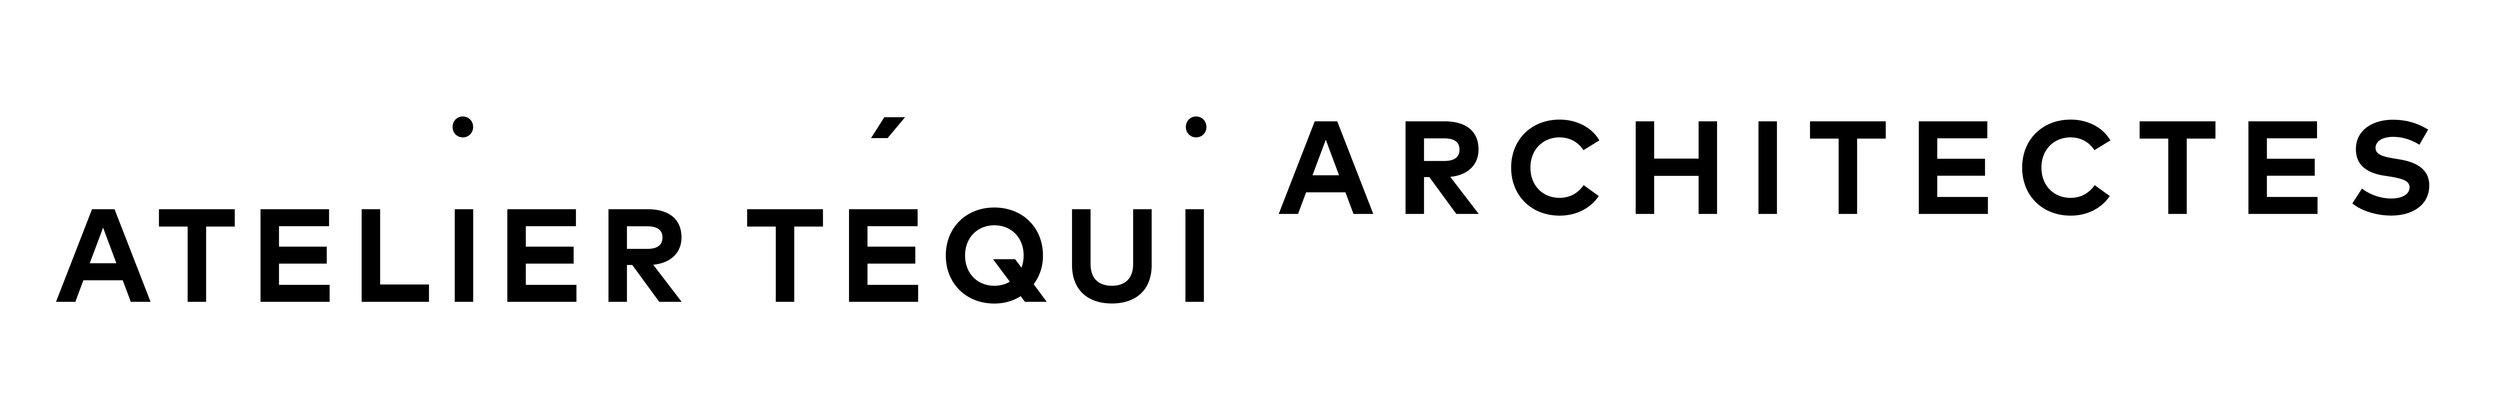 TEQUI_Logo_sans adresse hd.jpg